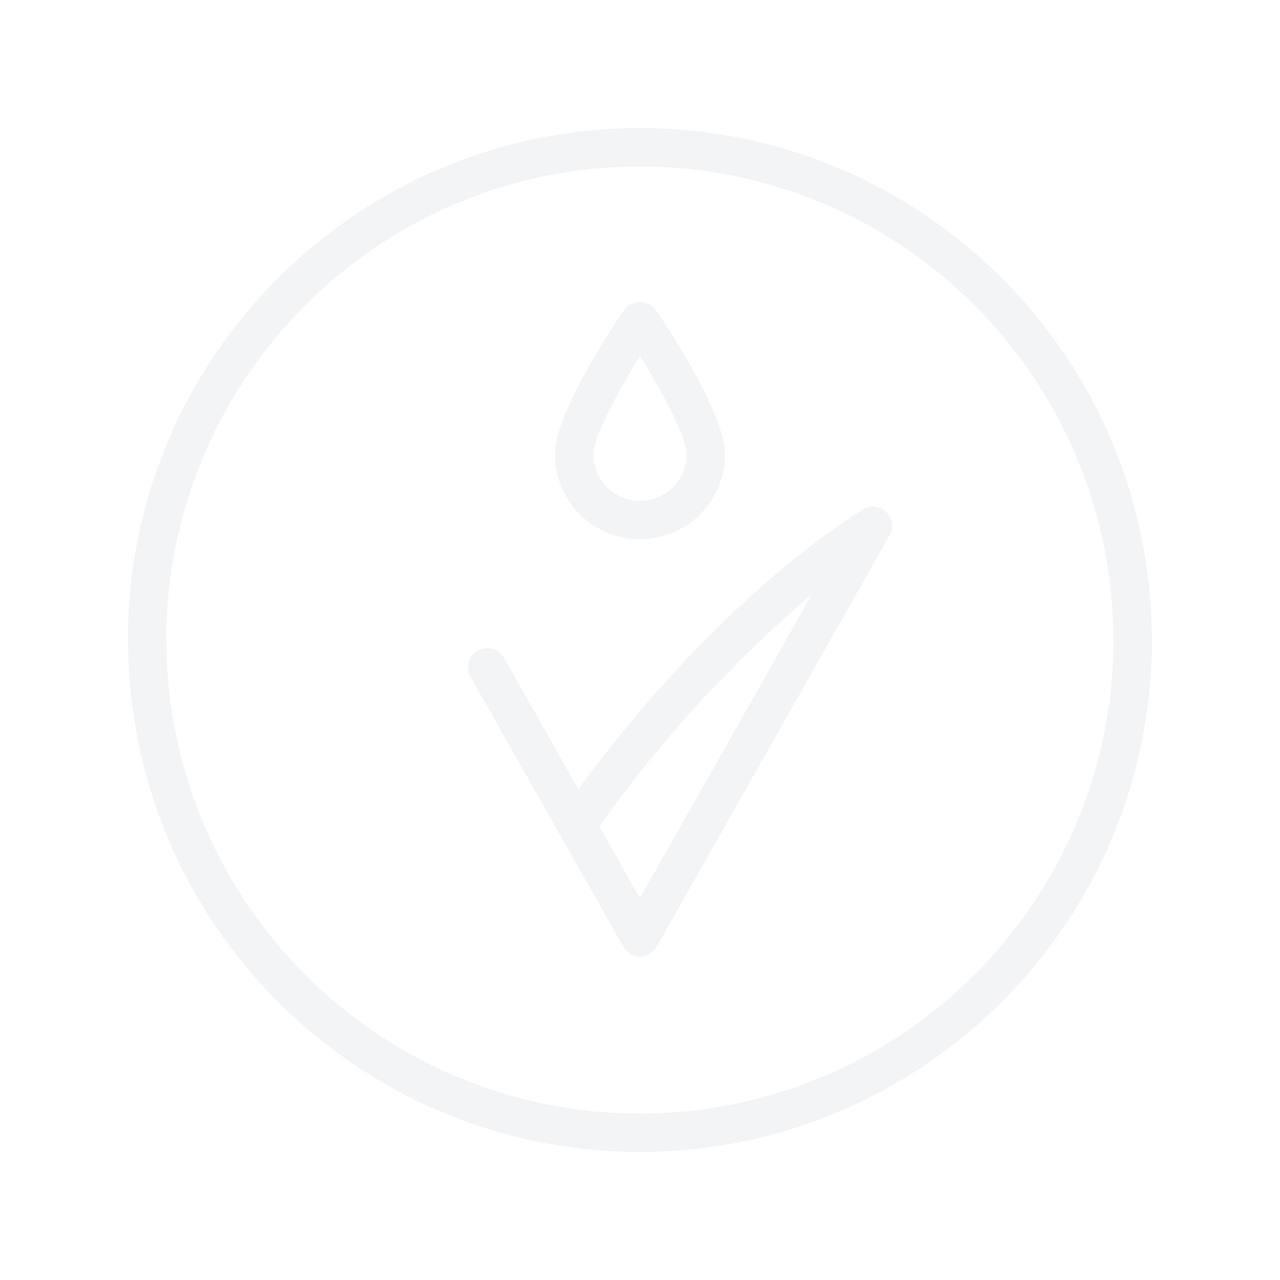 PAYOT Homme Optimale 24h Anti-Shine Fresh Gel 50ml матирующий гель